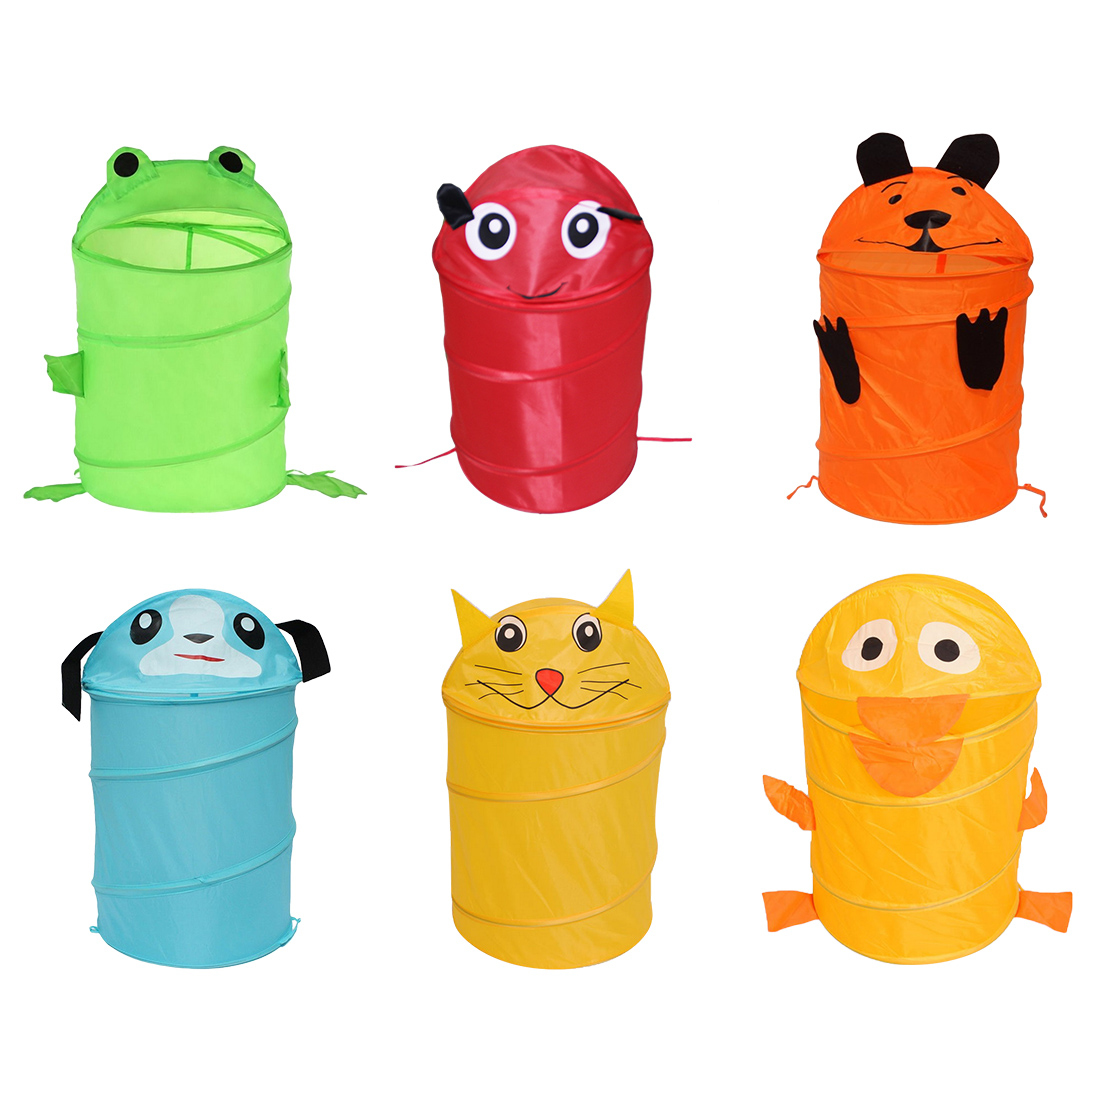 6 Style Cute Animal Big Capacity Waterproof Storage Bucket Laundry Basket Folding Cylinder Toy  Dirty Clothes Box Organizer